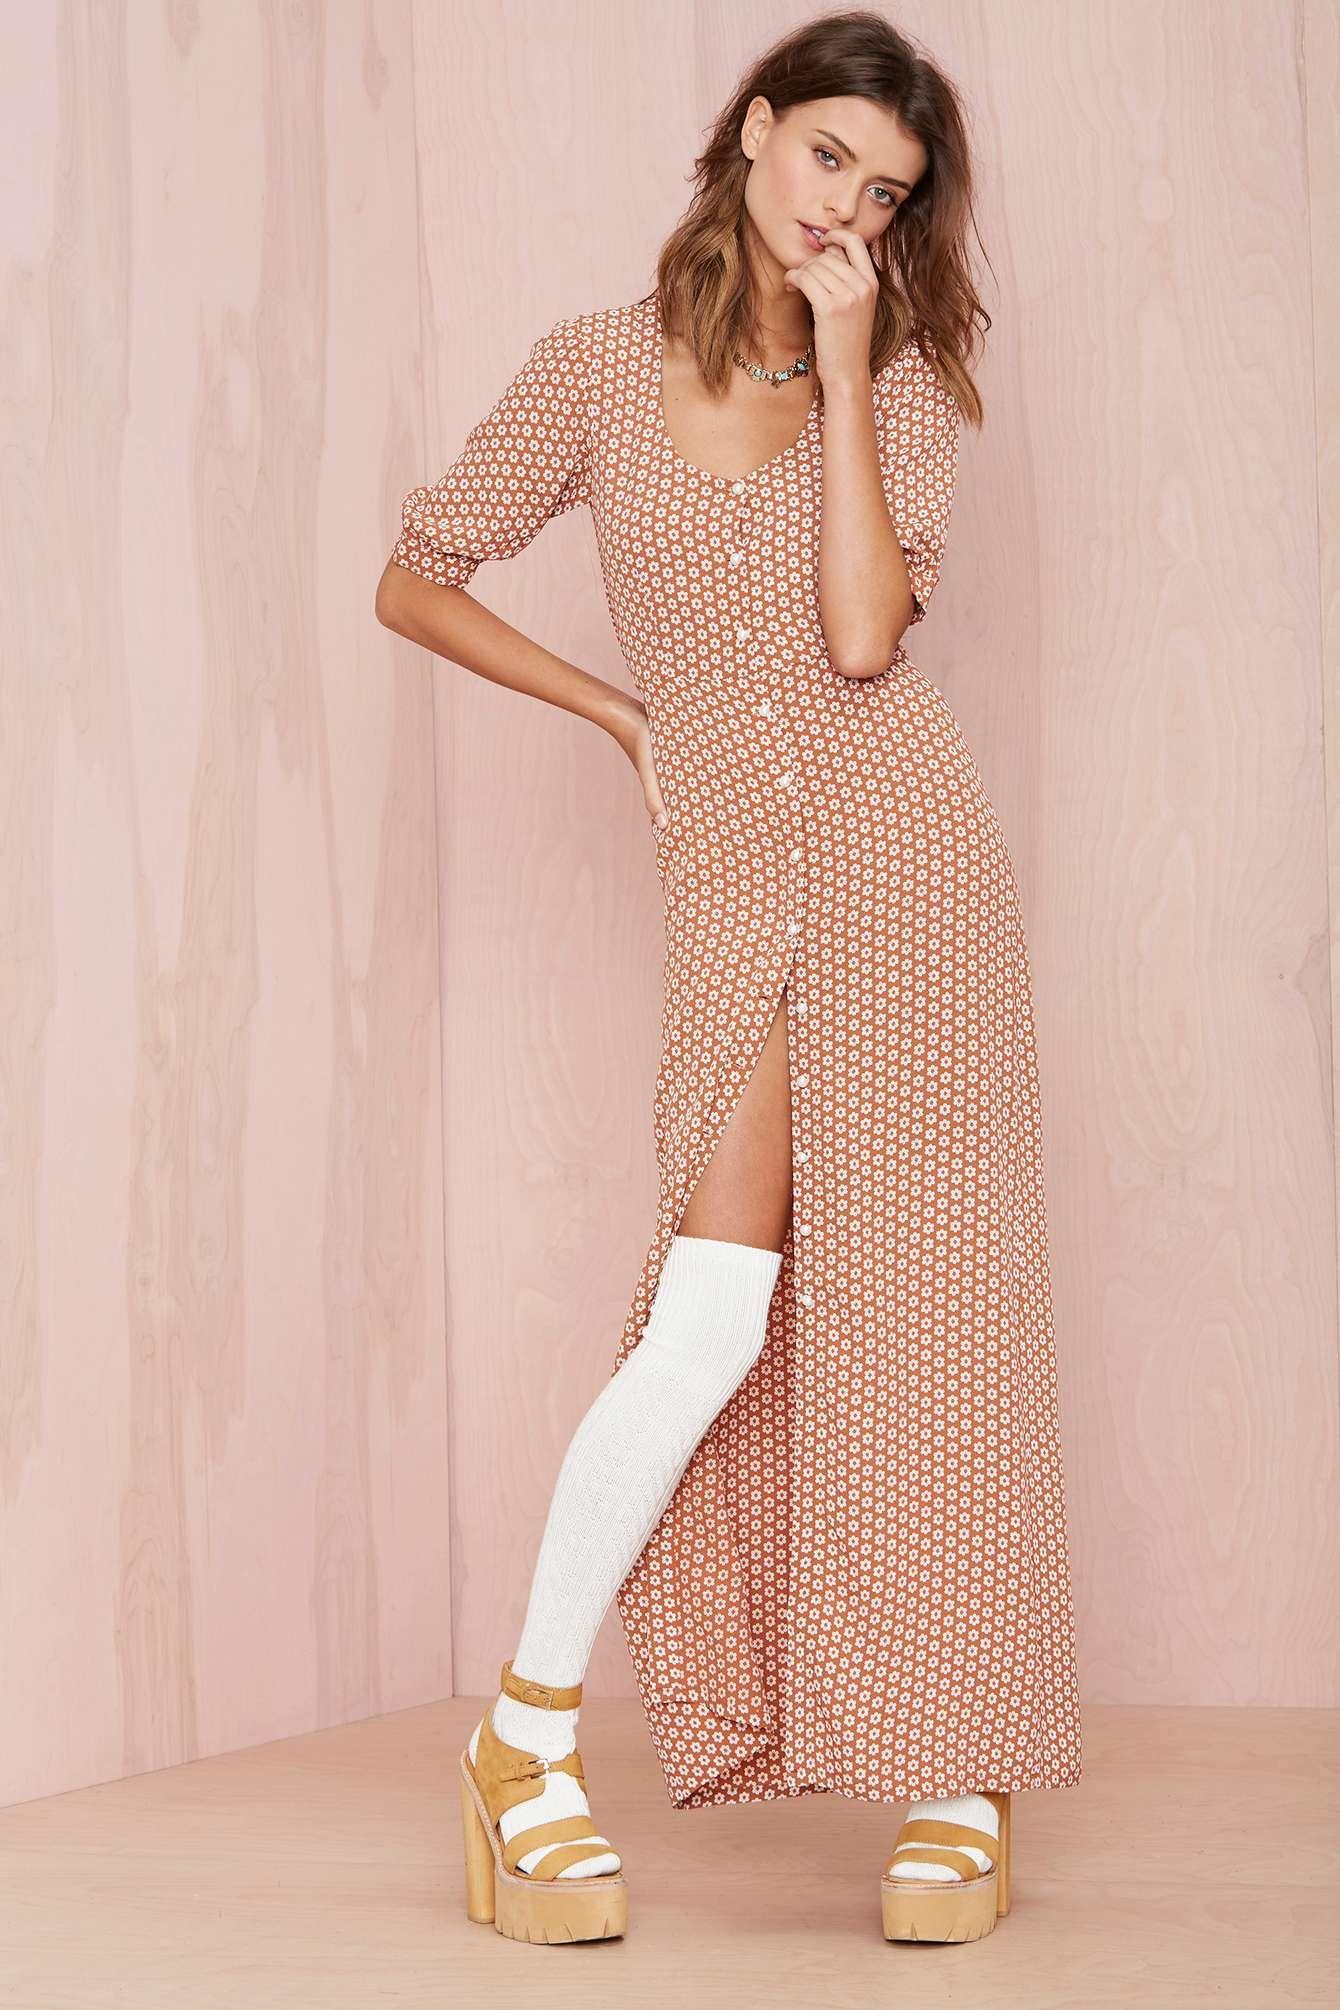 For Love And Lemons Montana Maxi Dress Maxi Dress Shop Maxi Dresses Beautiful Outfits